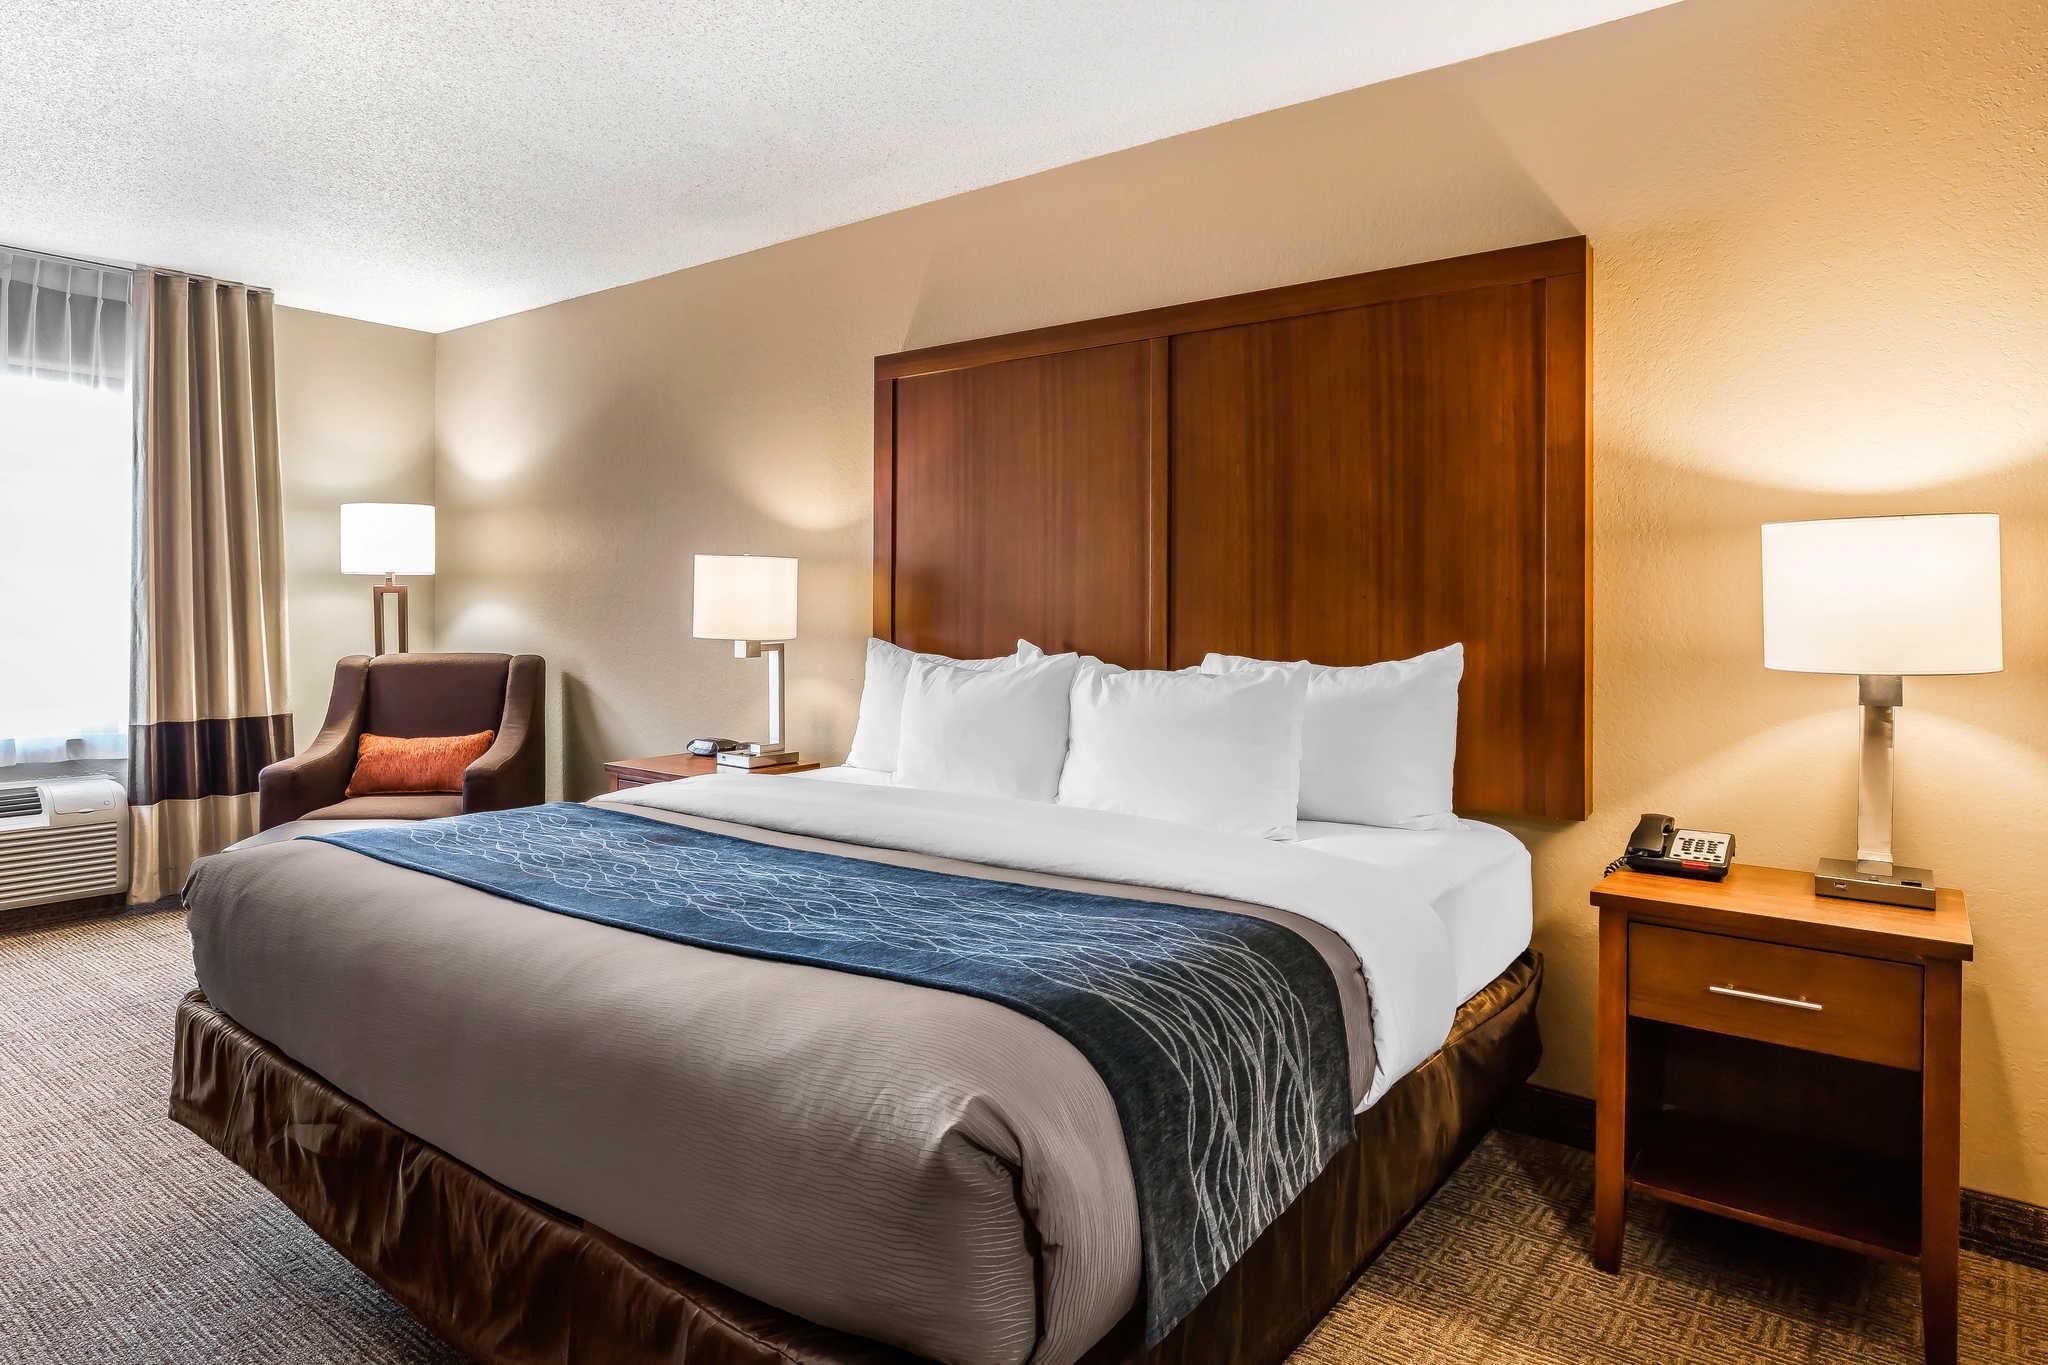 Comfort Inn & Suites Airport-American Way image 7